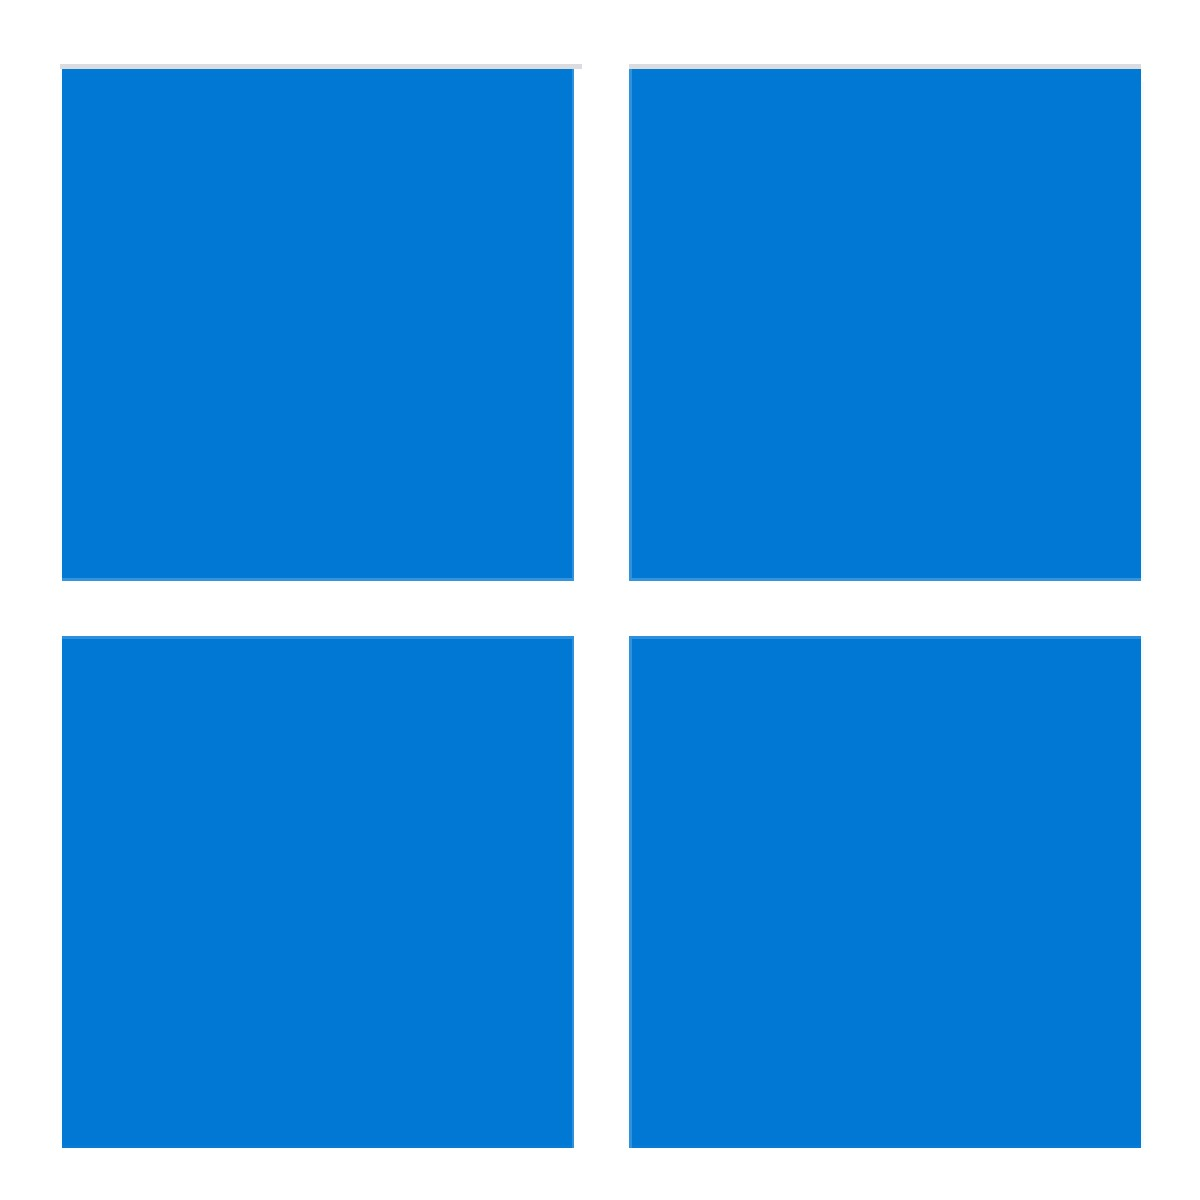 Download Windows 11 ISO File (2021 Latest Version) free Download [32 Bit/64 Bit]